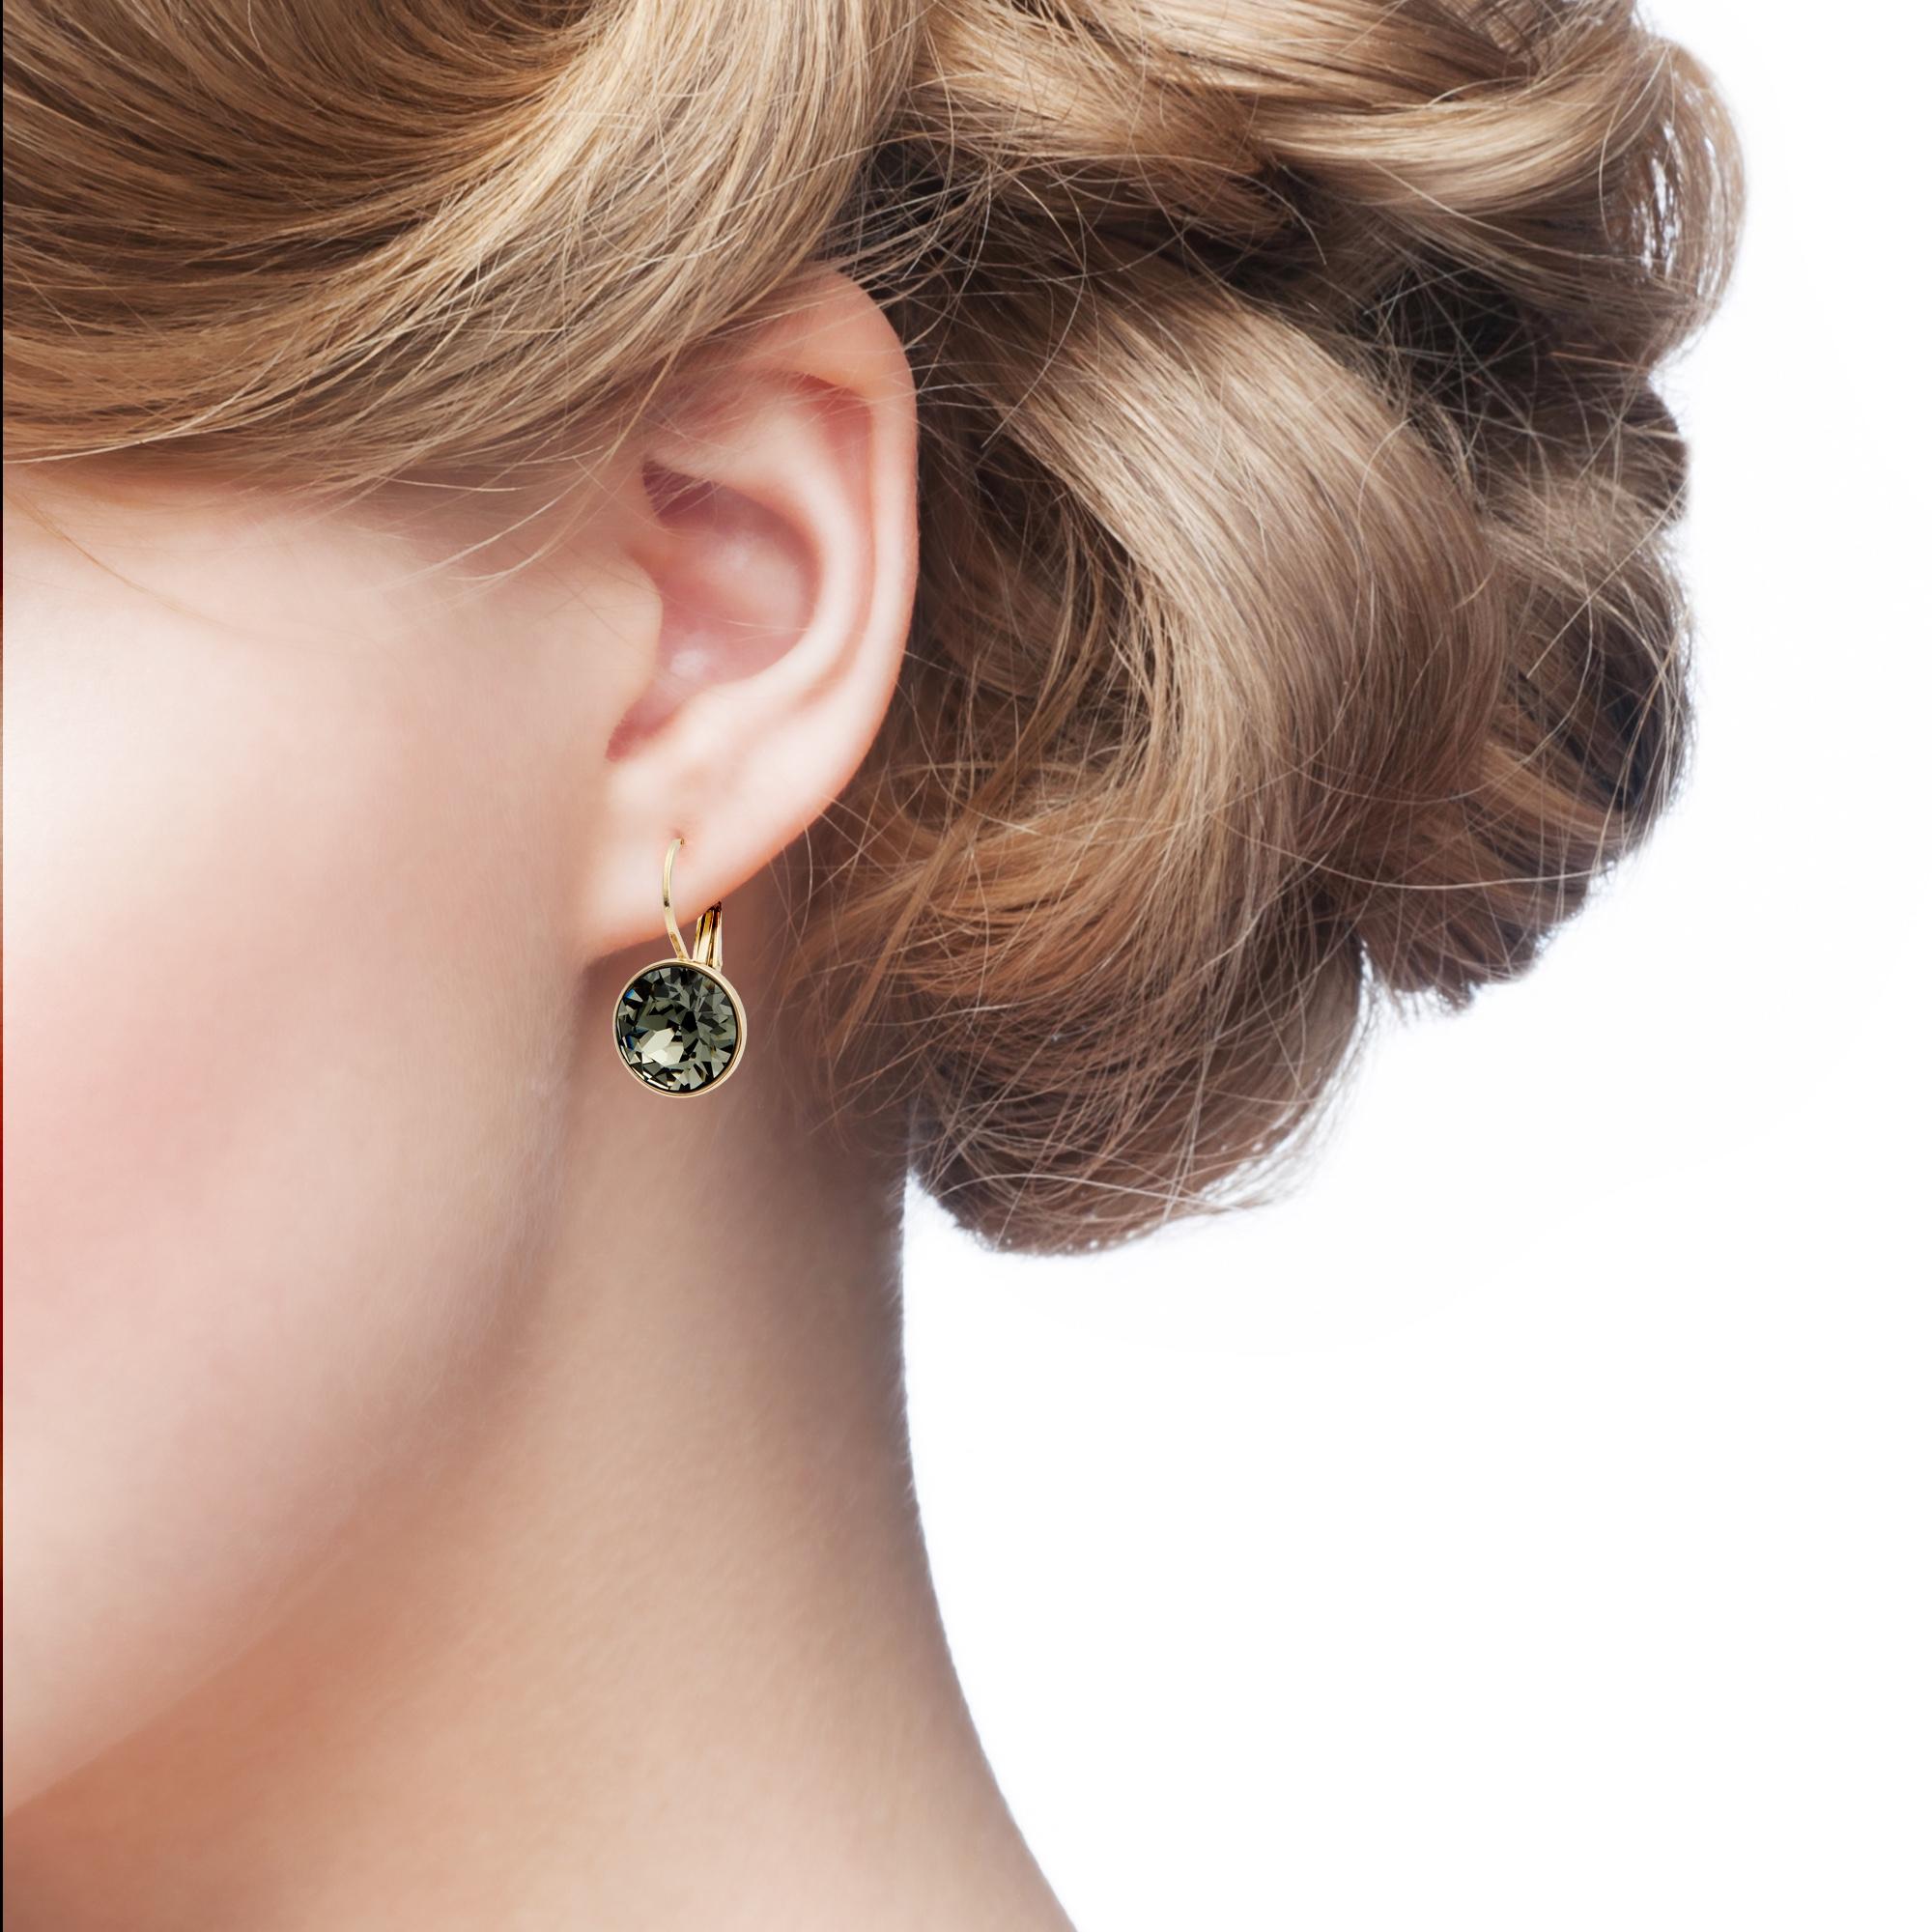 bella mini hoop earrings w black diamond swarovski crystals gp authentic myjs ebay. Black Bedroom Furniture Sets. Home Design Ideas